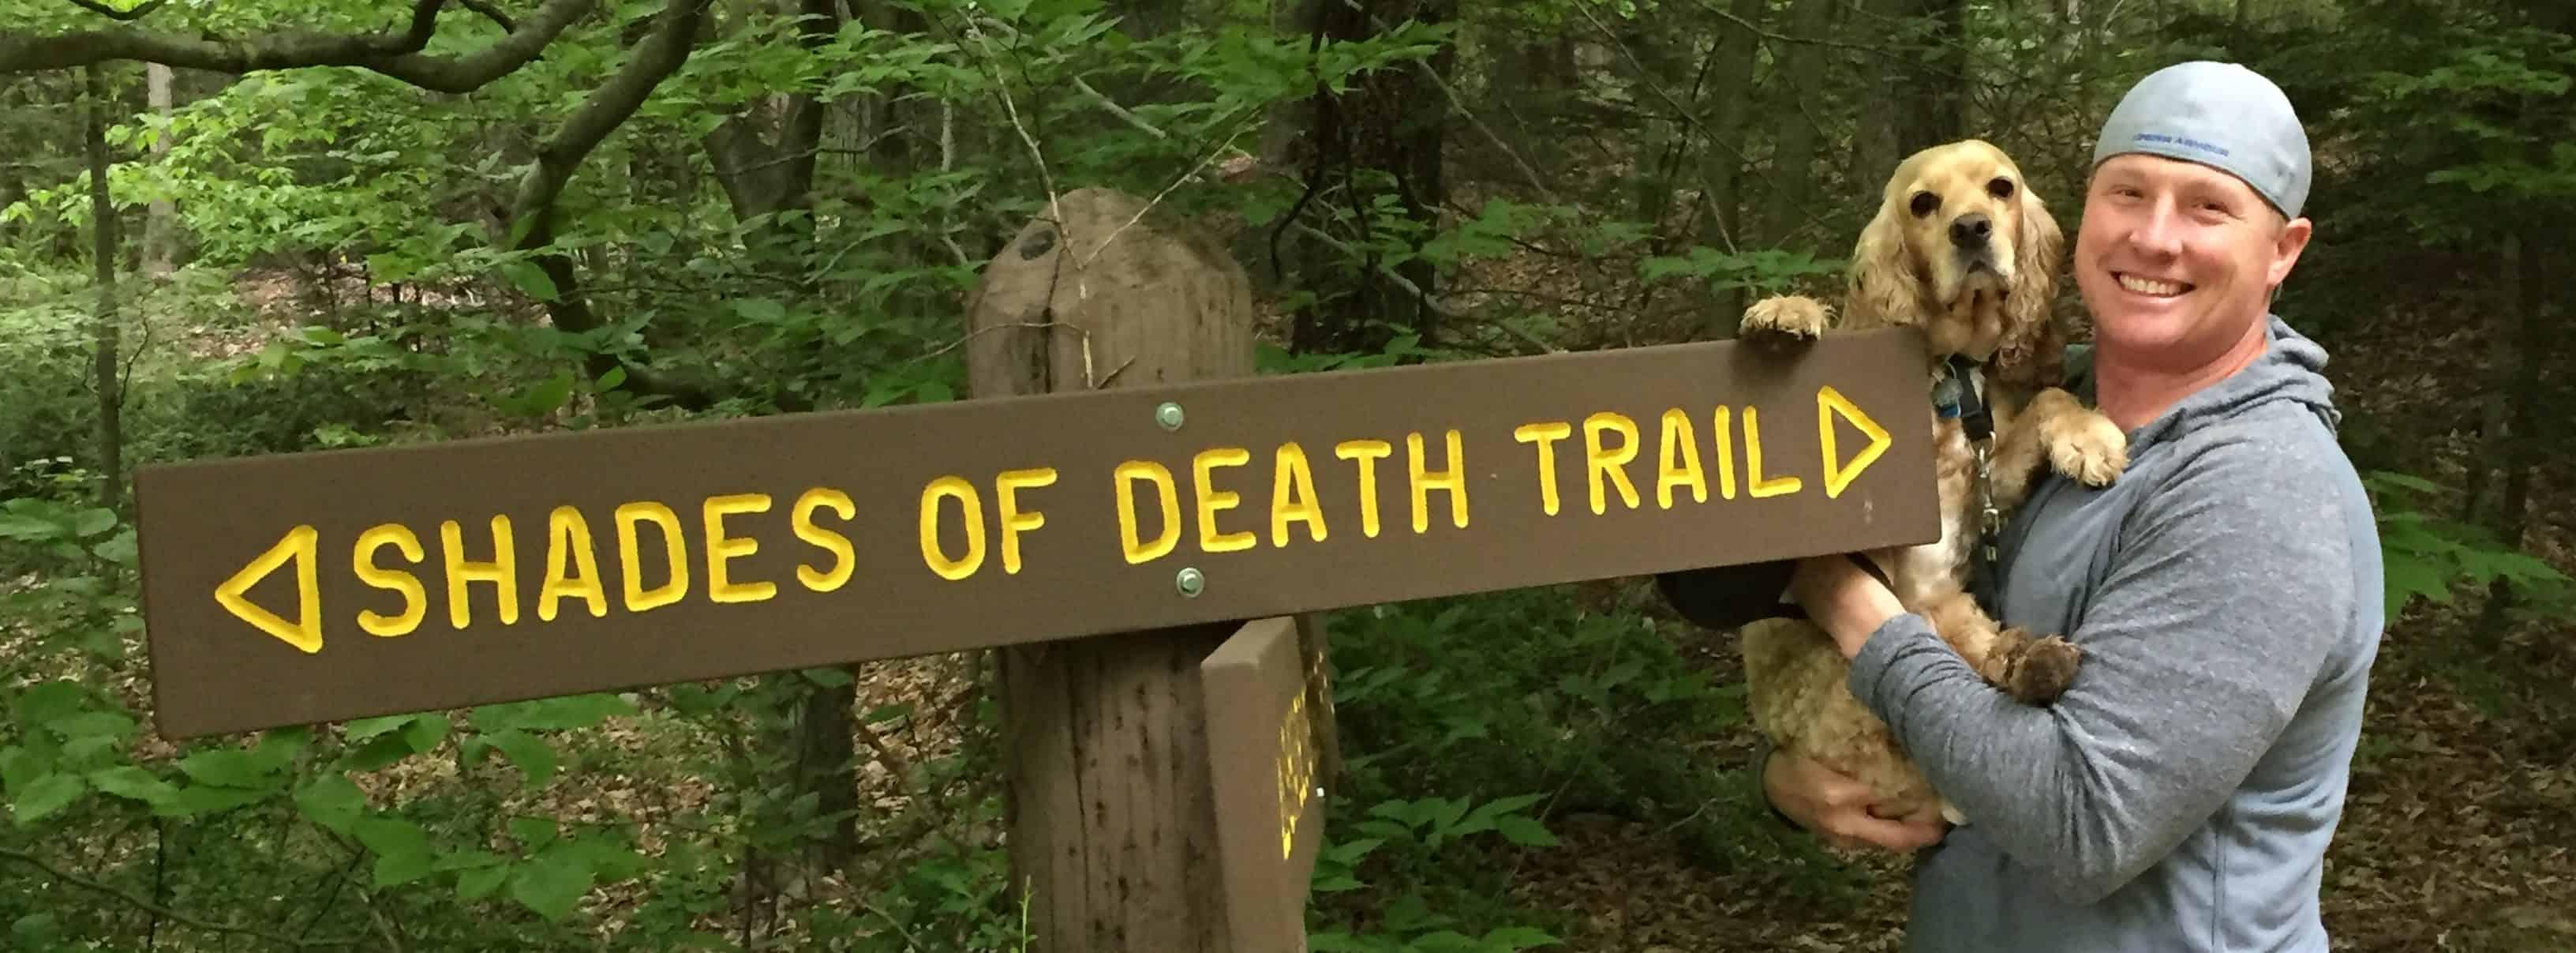 Shades of Death Trail